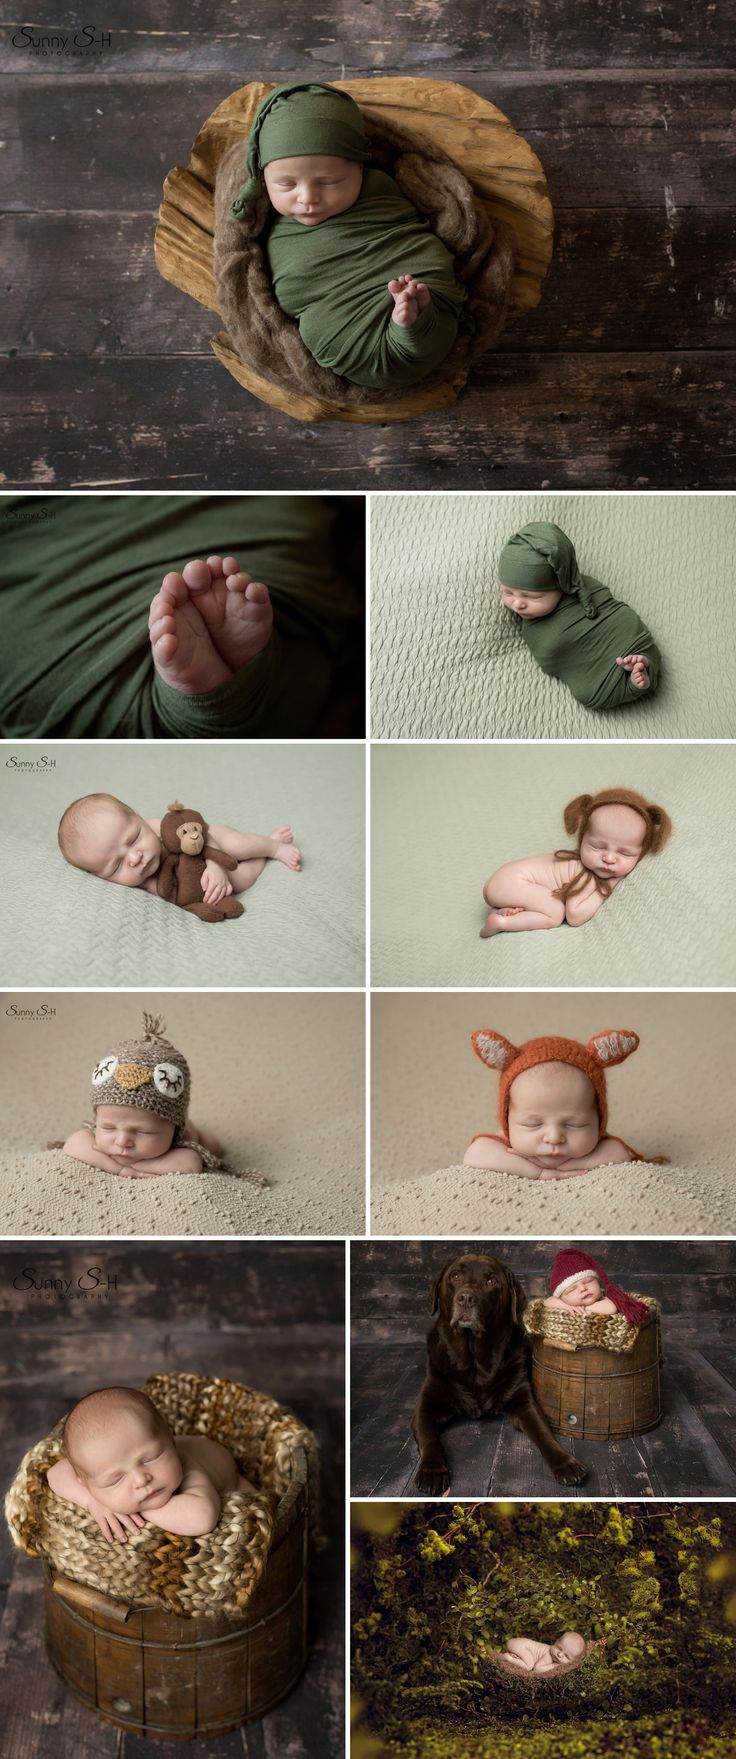 Woodlands theme newborn photo session in studio. Sunny S-H Photography Winnipeg